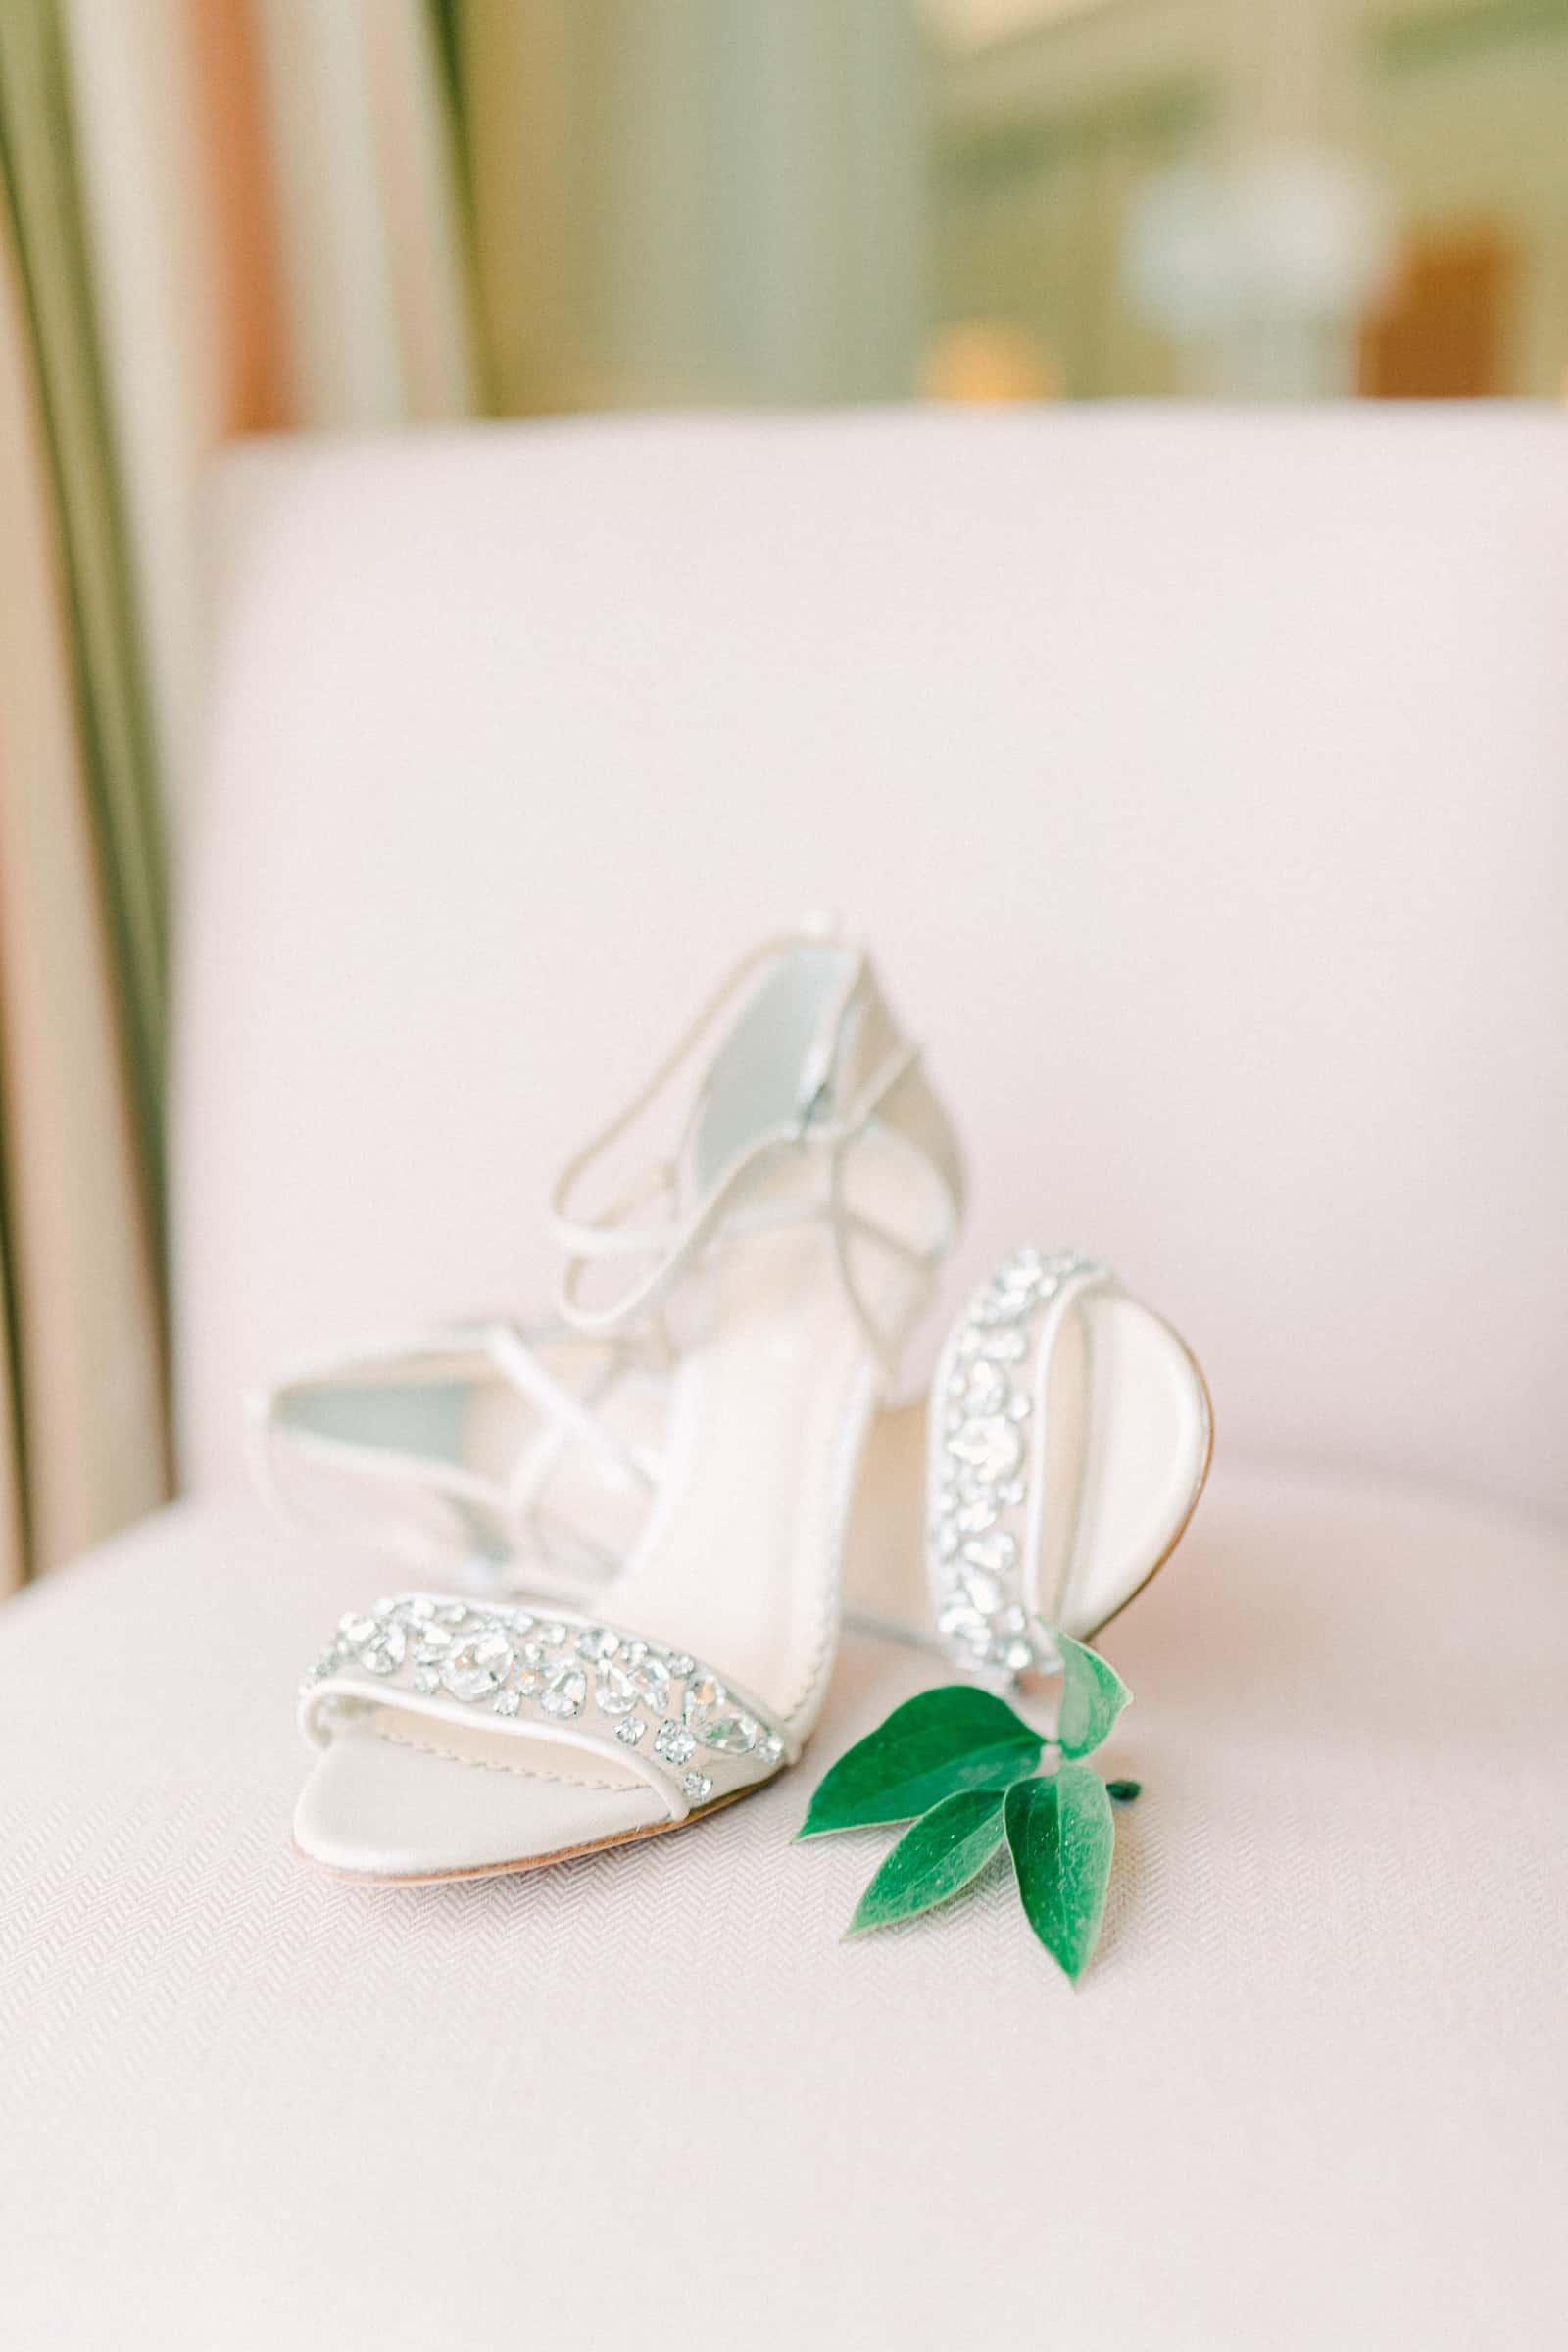 Jeweled bride's wedding shoes